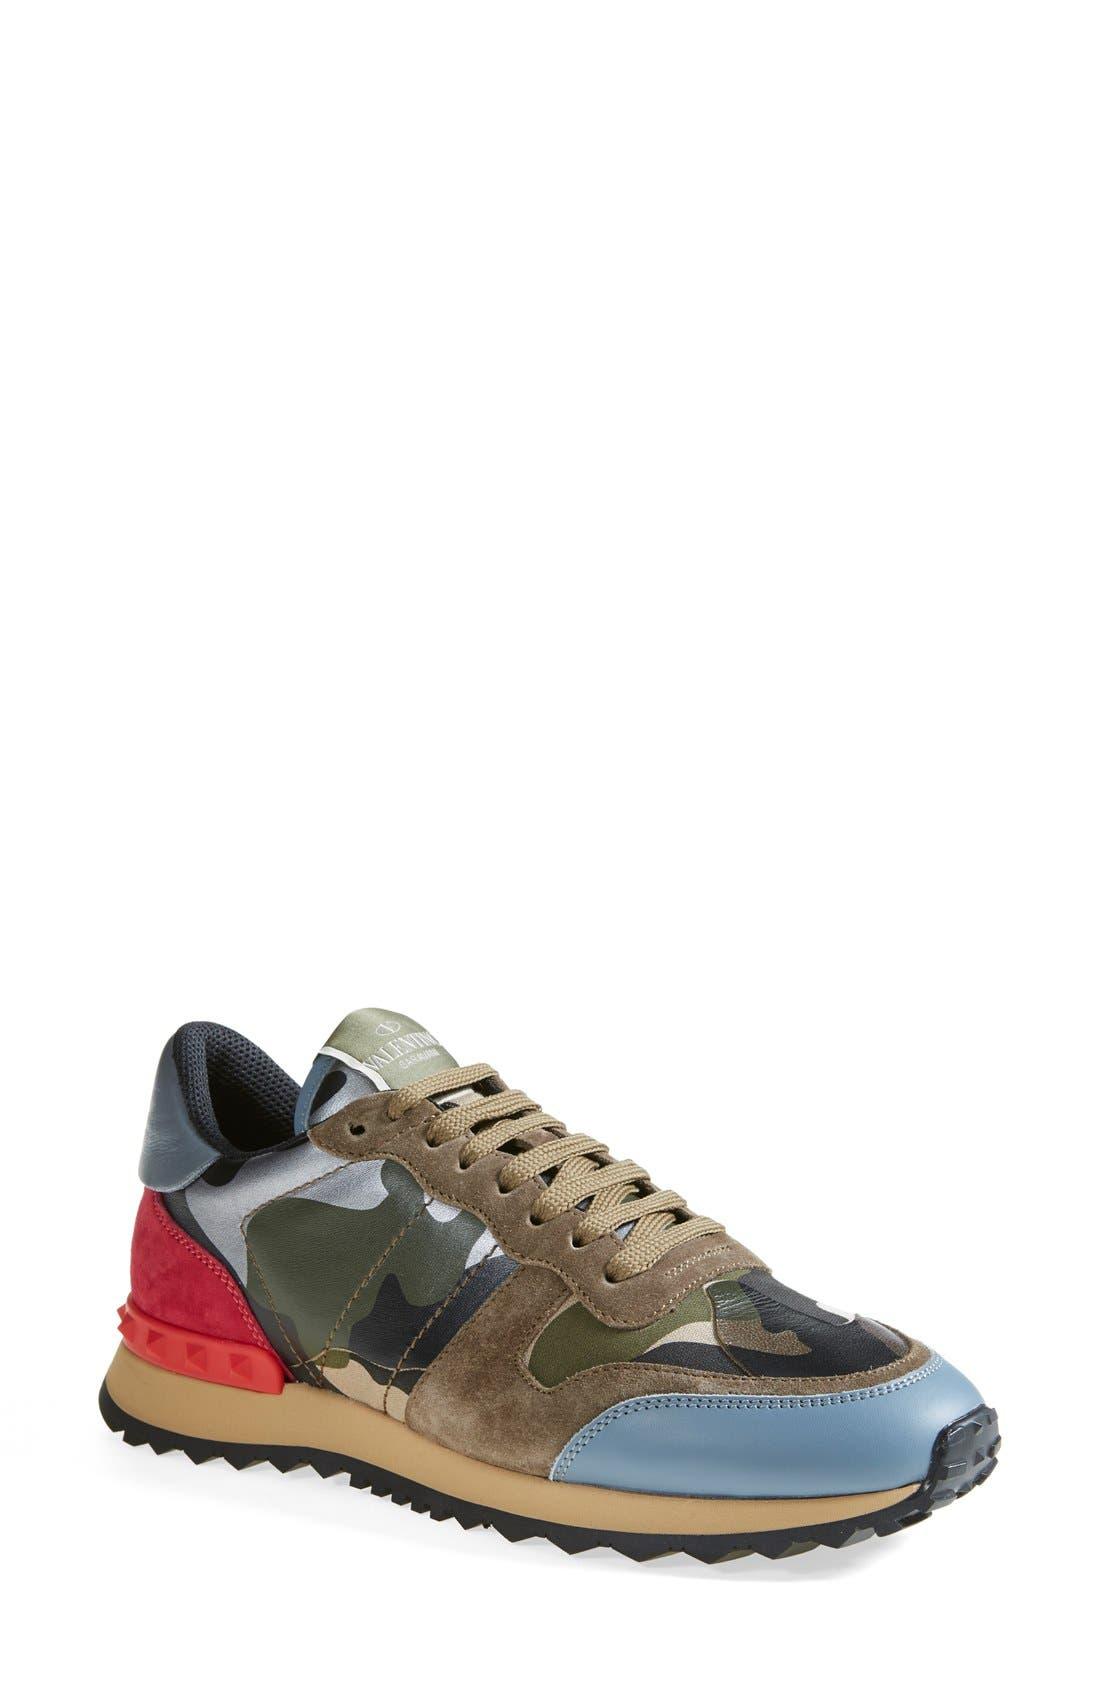 Alternate Image 1 Selected - VALENTINO GARAVANI Camouflage Sneaker (Women)